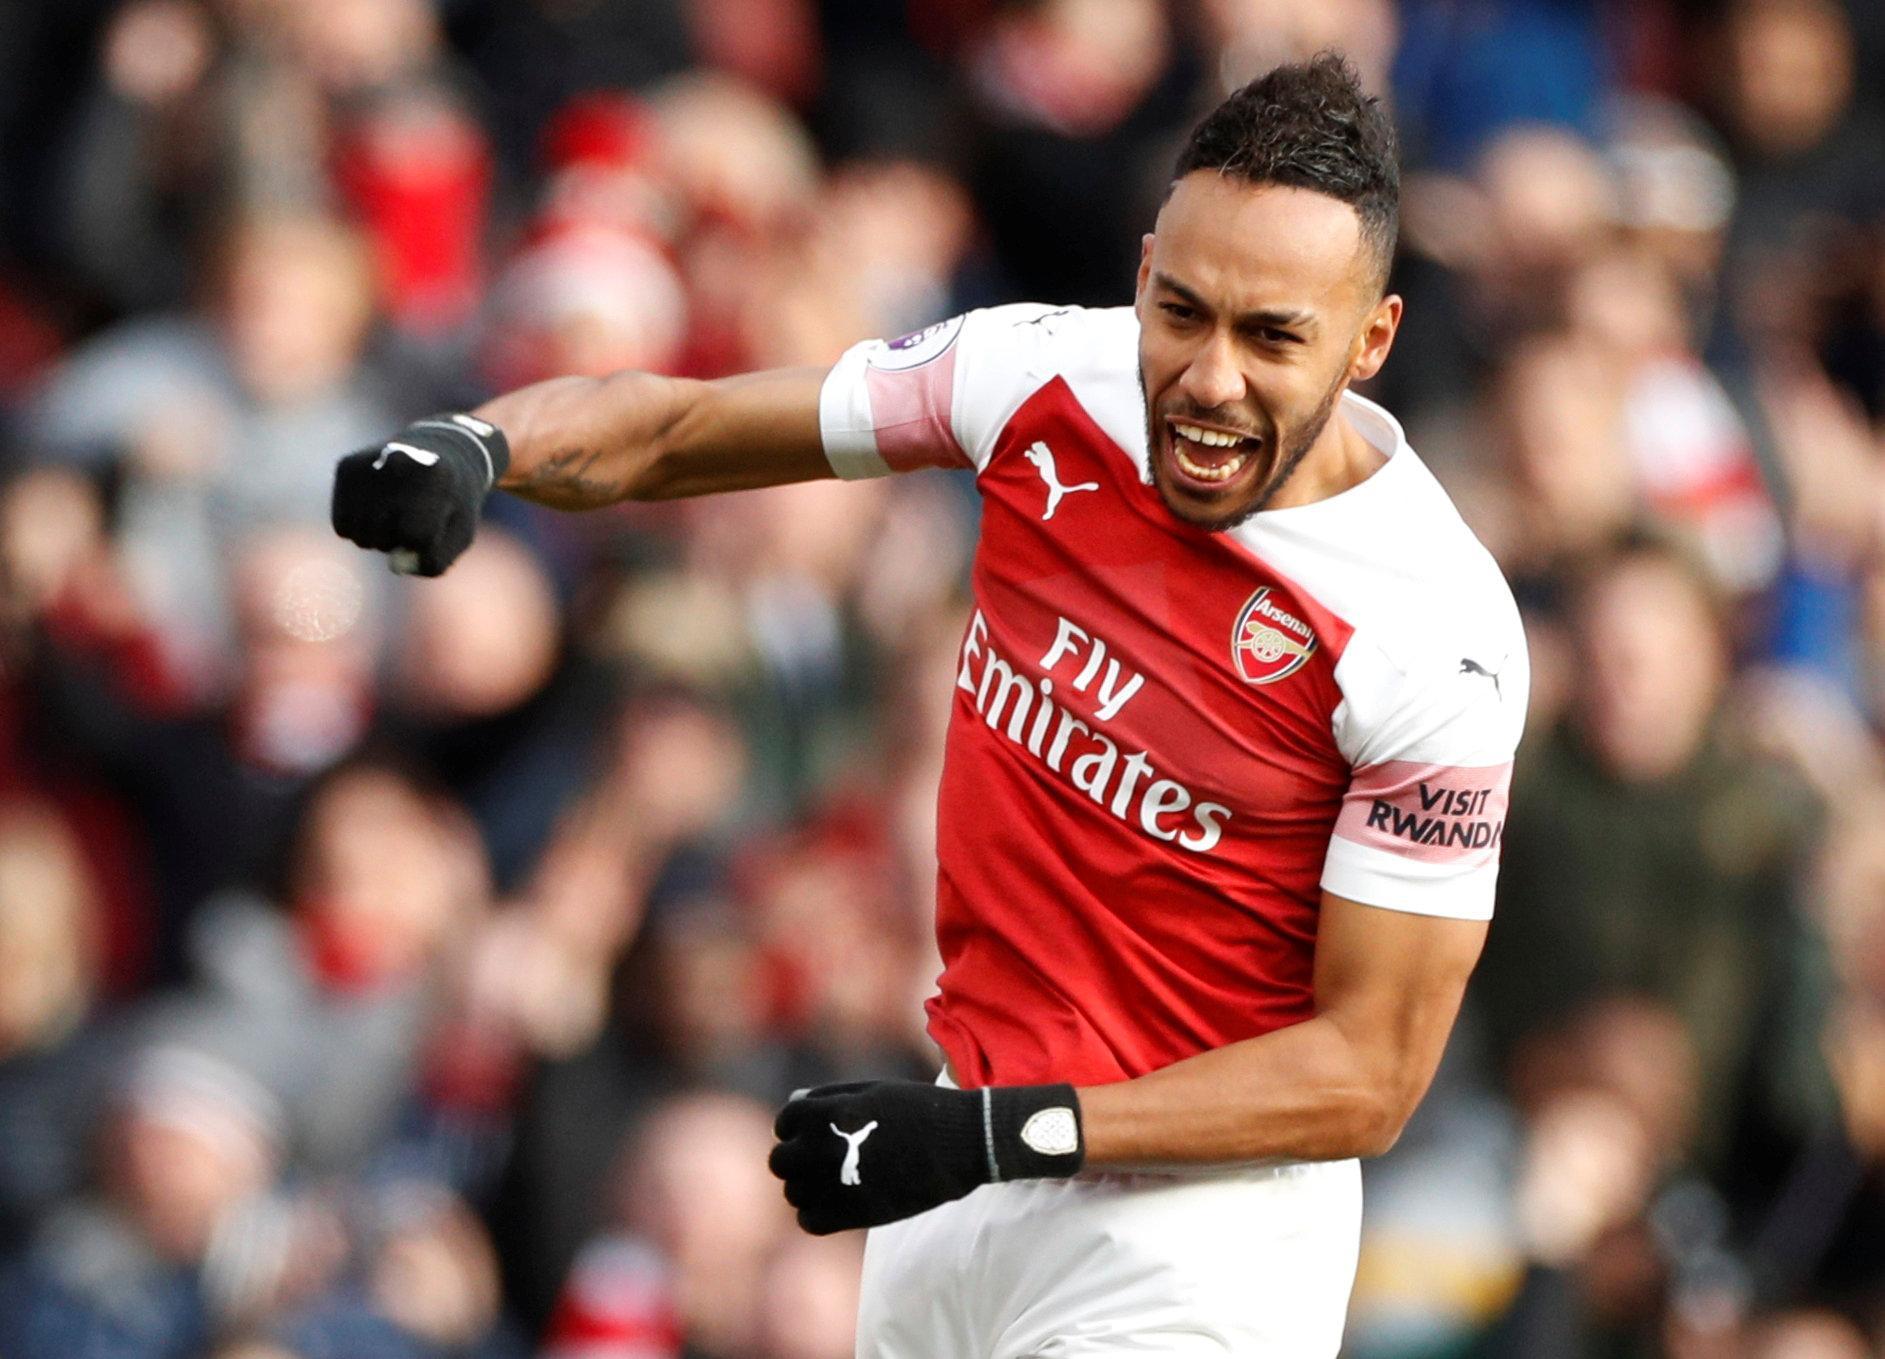 The striker is Arsenal's top goalscorer this season